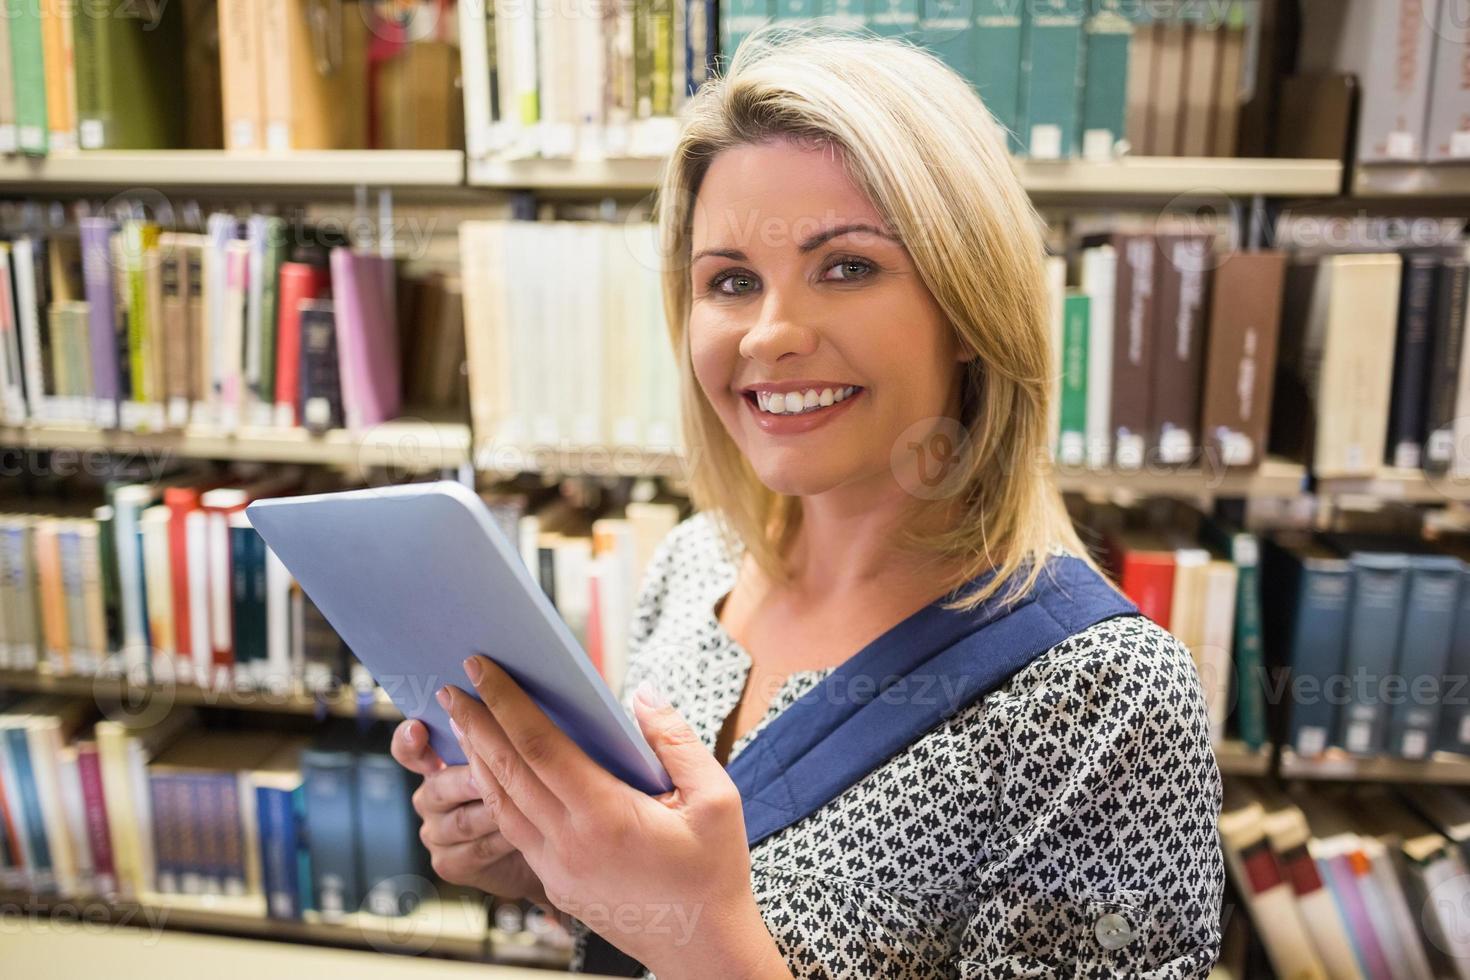 estudiante maduro usando tableta en biblioteca foto